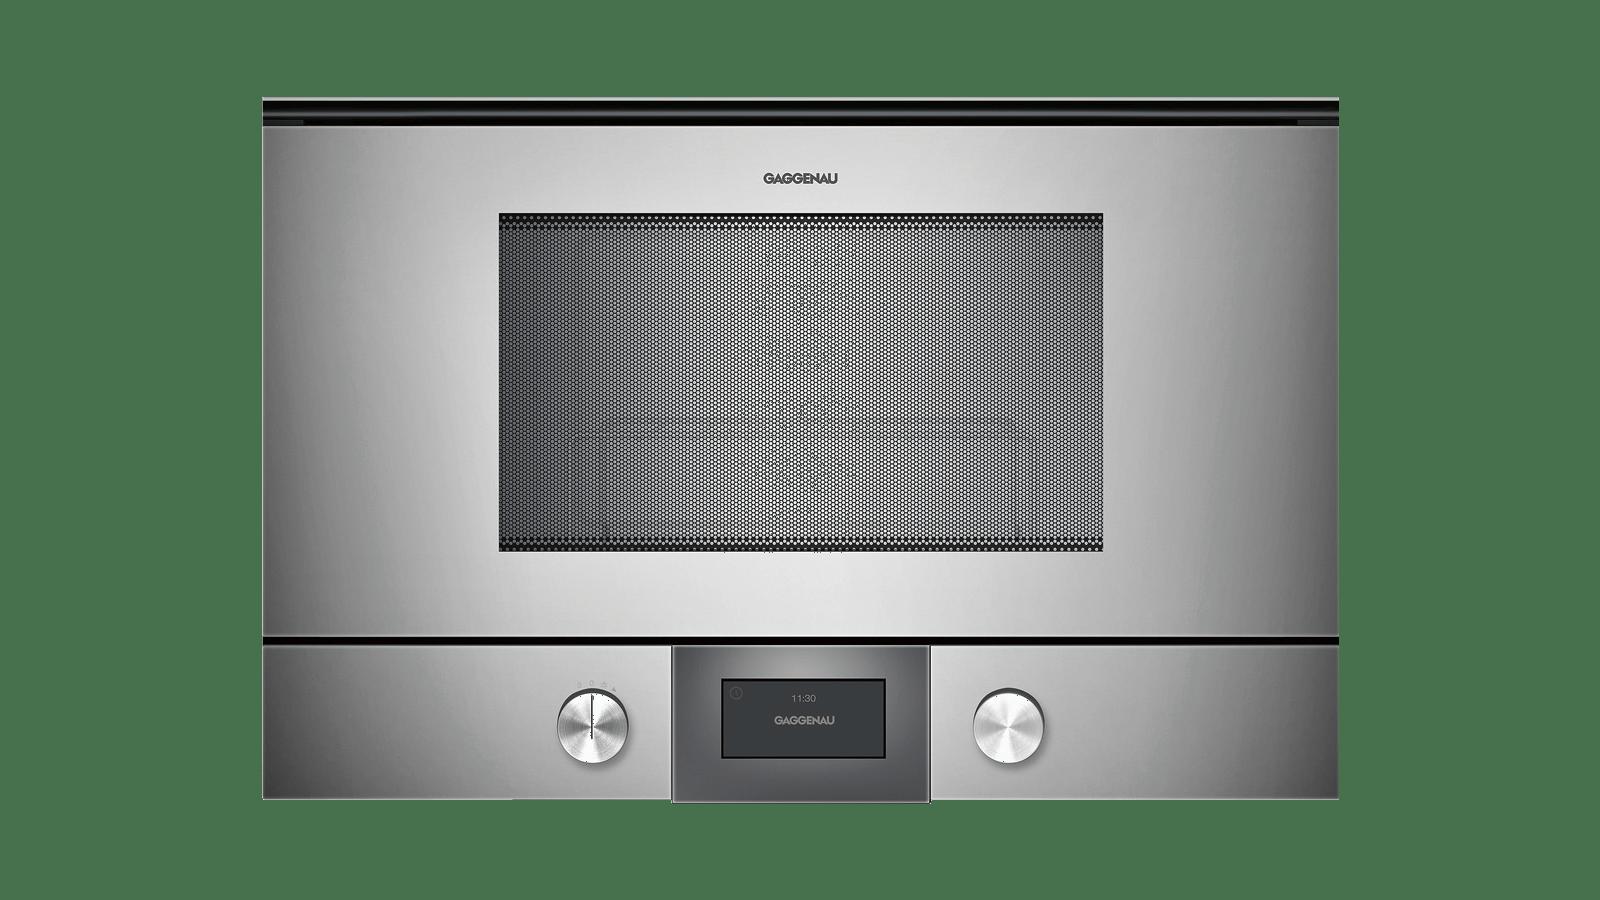 Micro Onde Au Dessus Du Four four micro-ondes série 200 porte plein verre en gaggenau